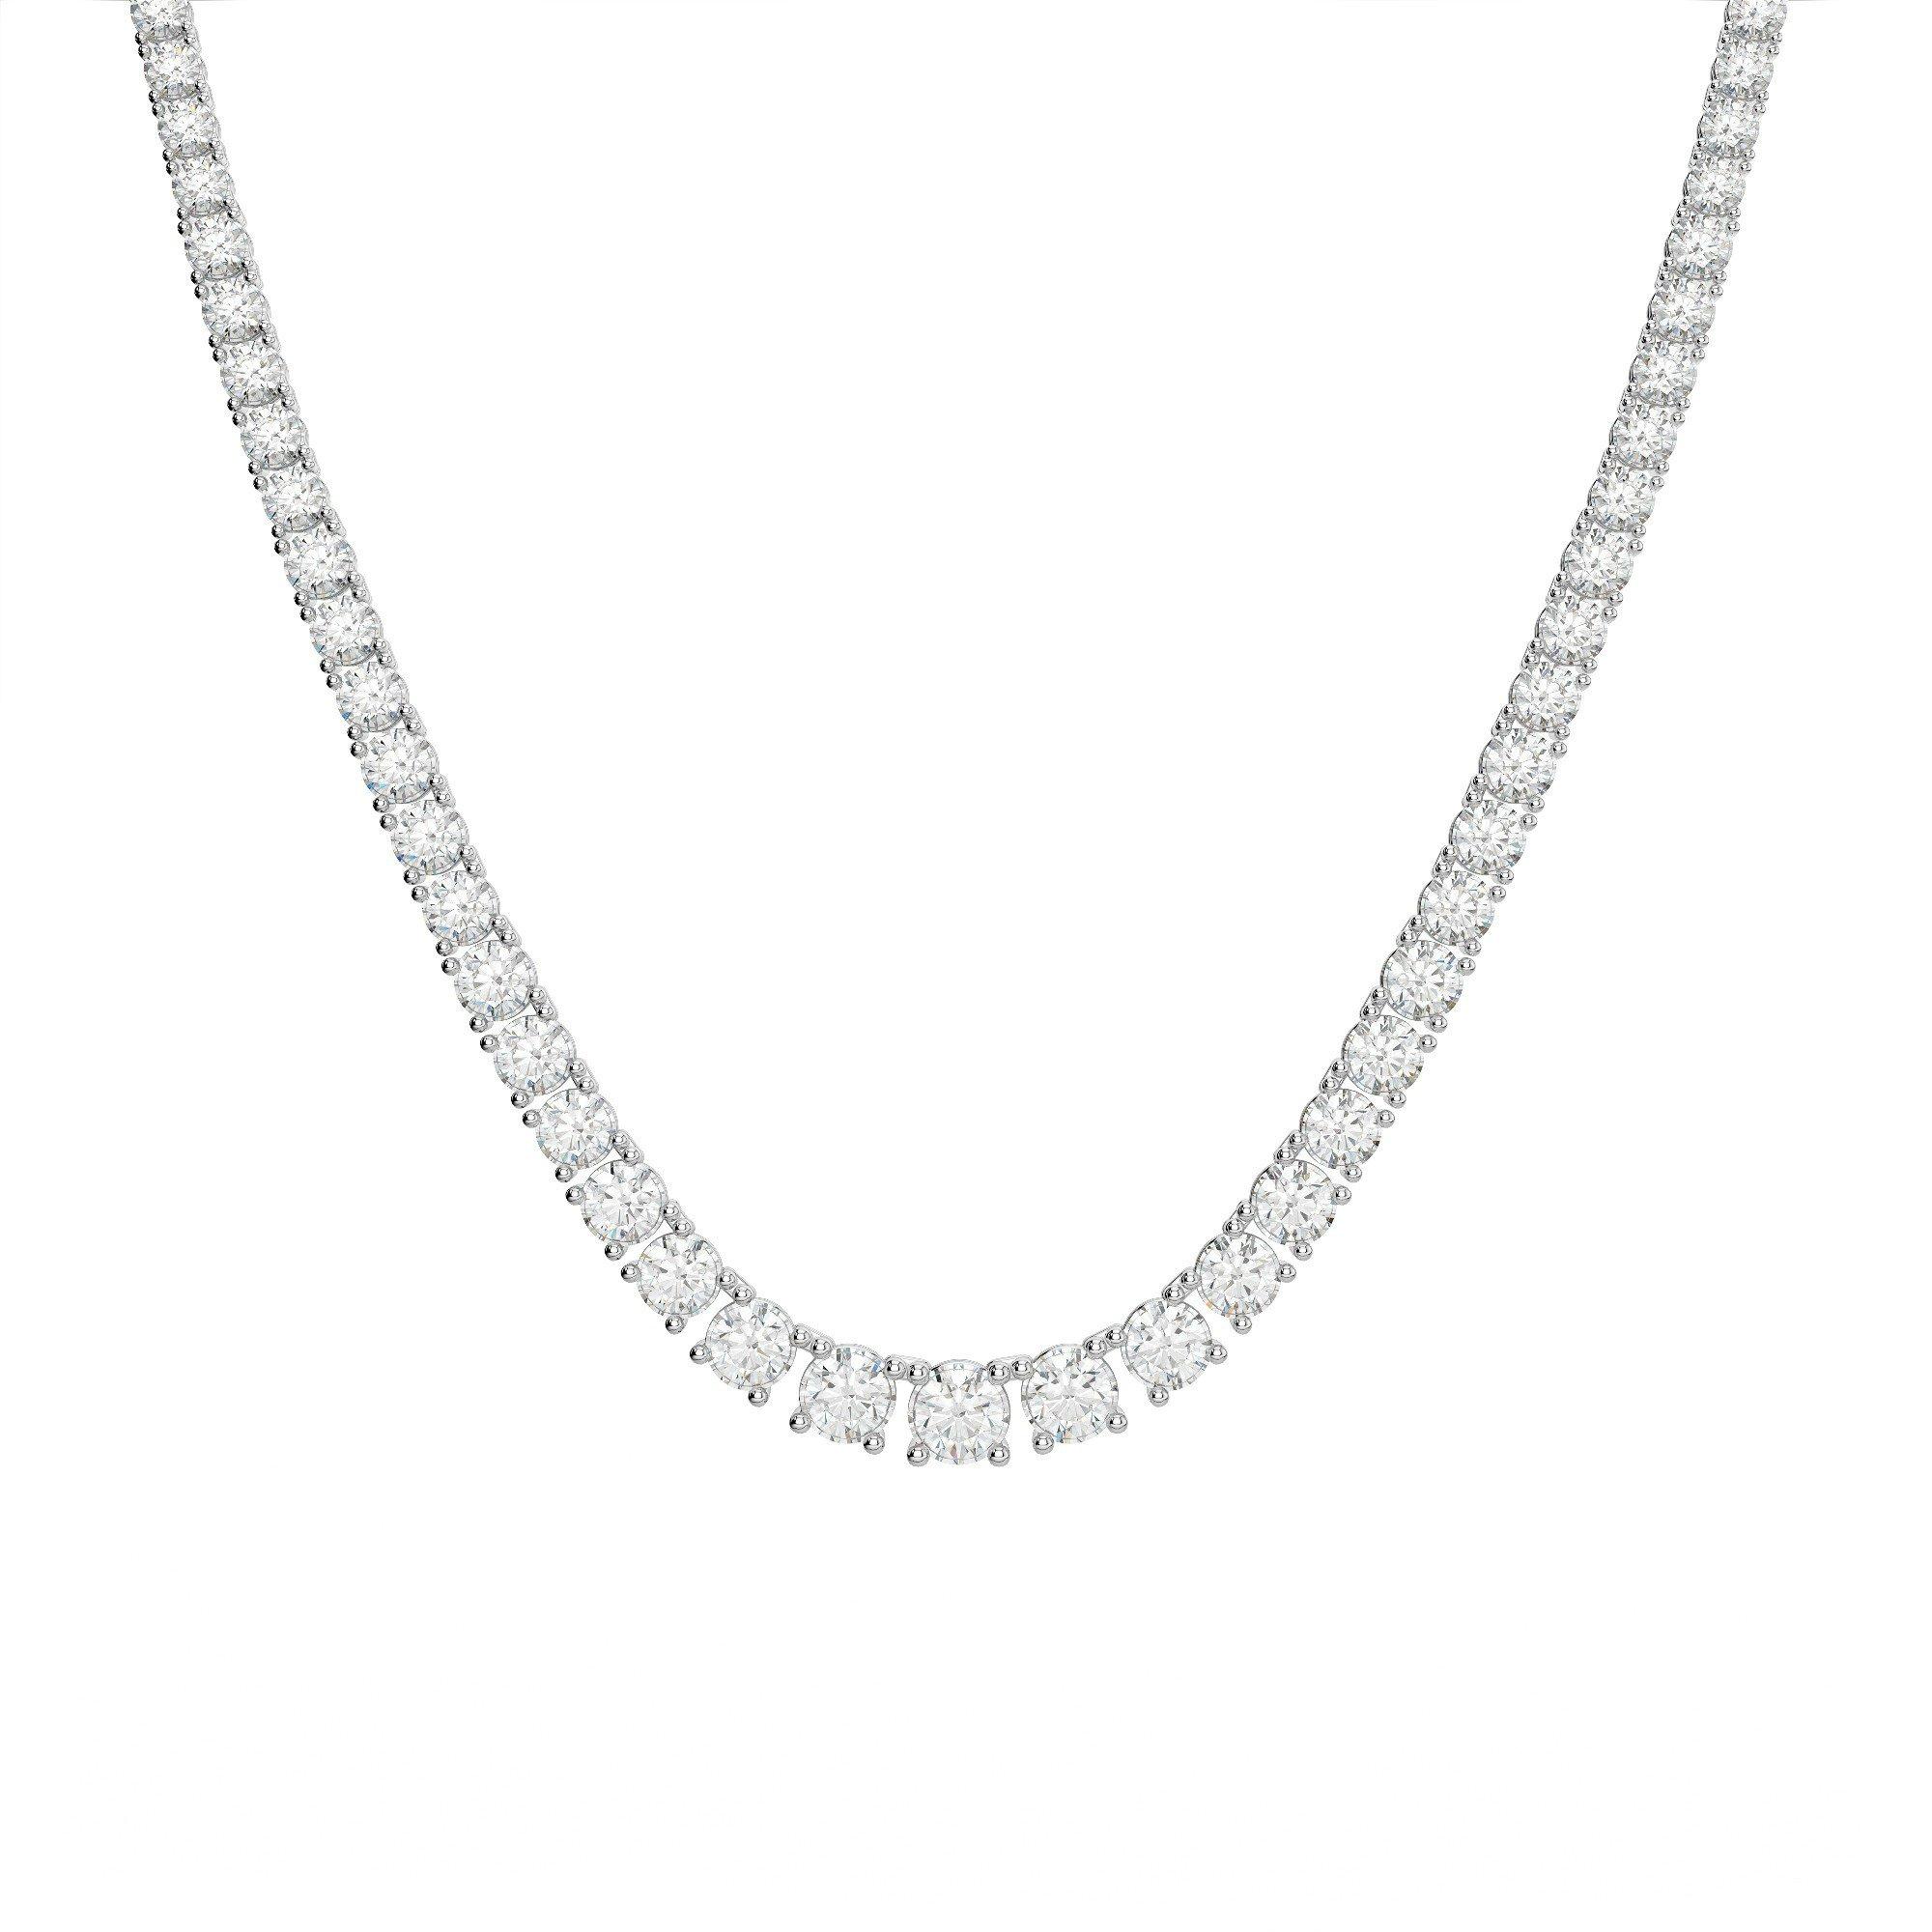 15 Carat Diamond Tennis Necklace